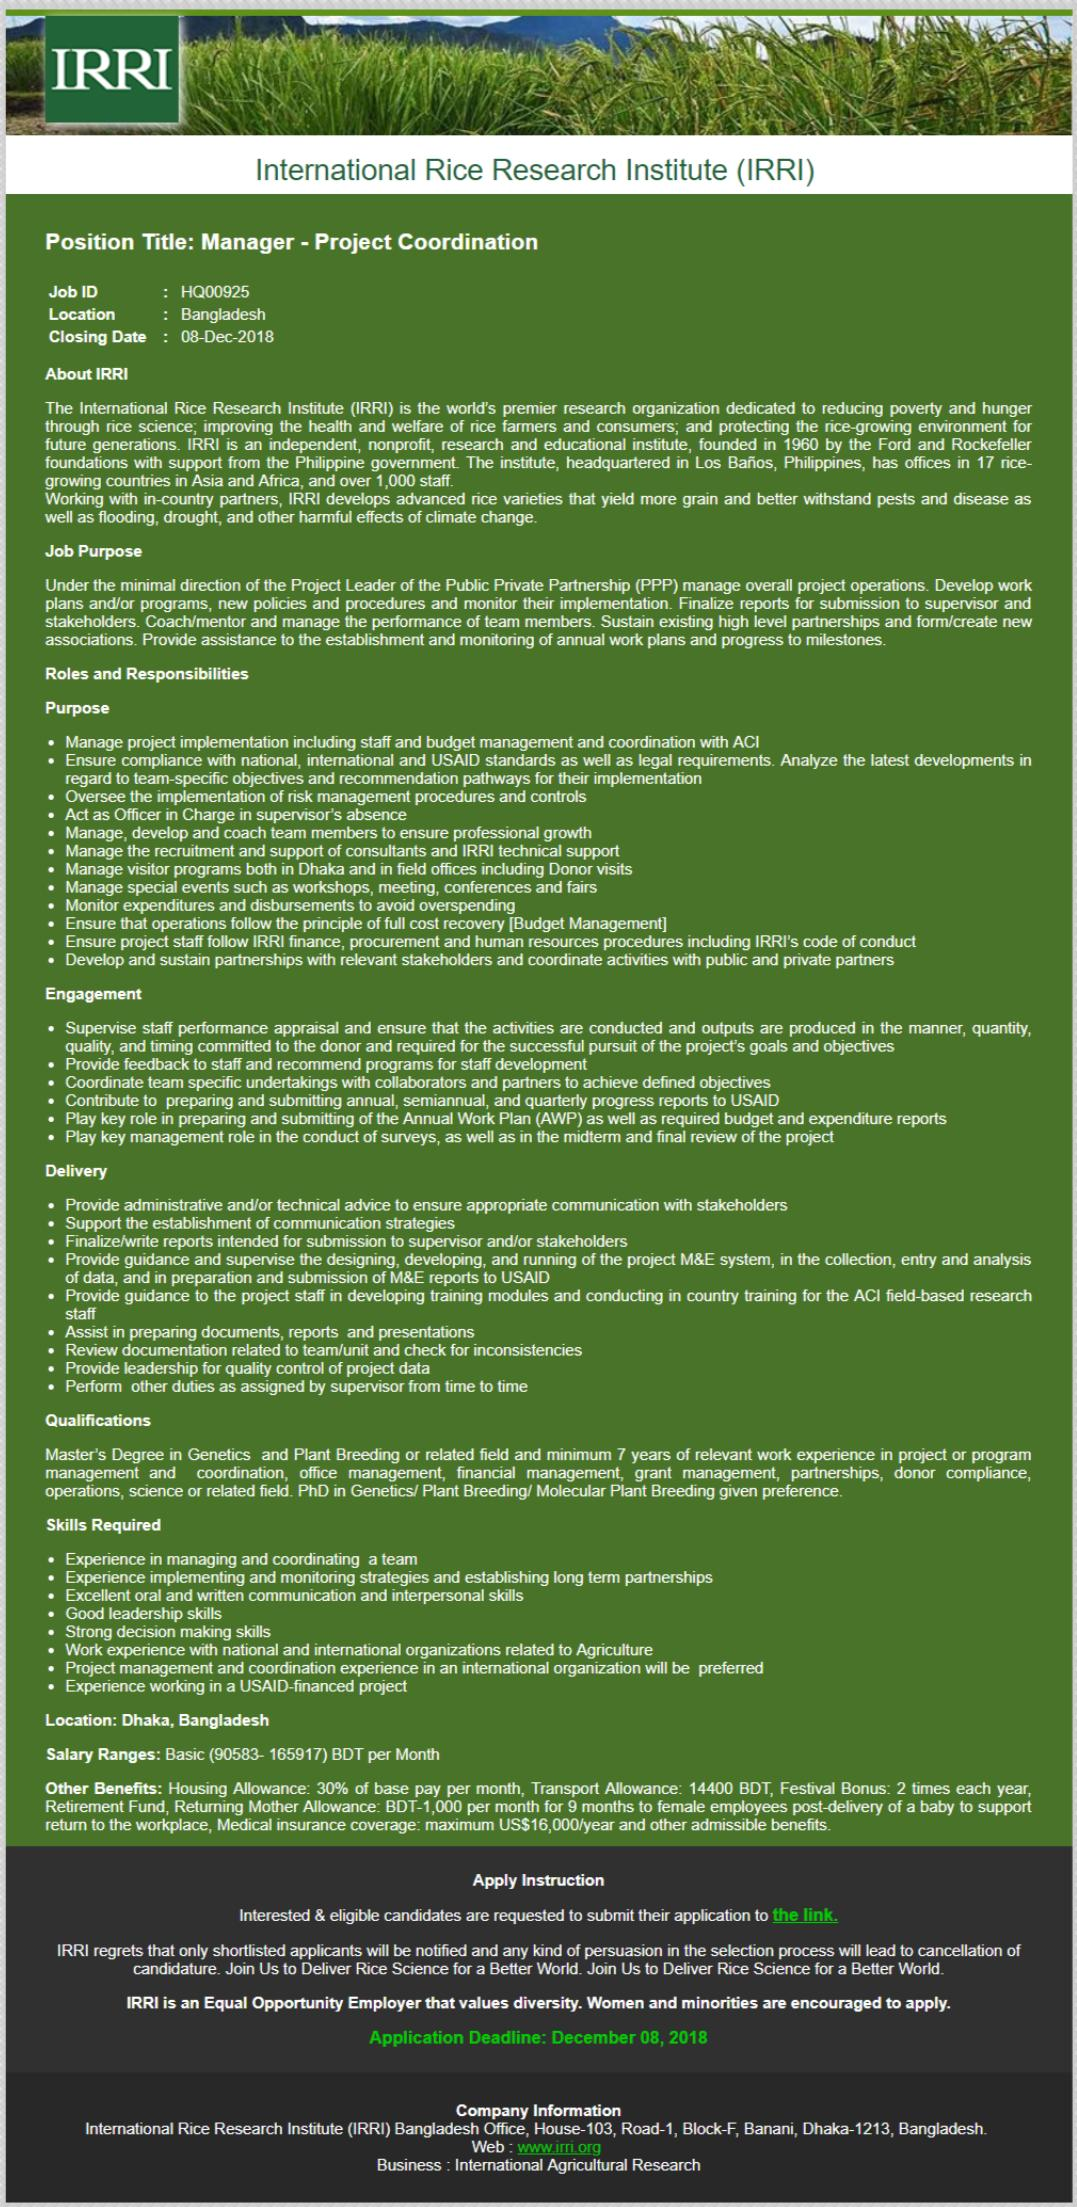 IRRI job circular in 2018